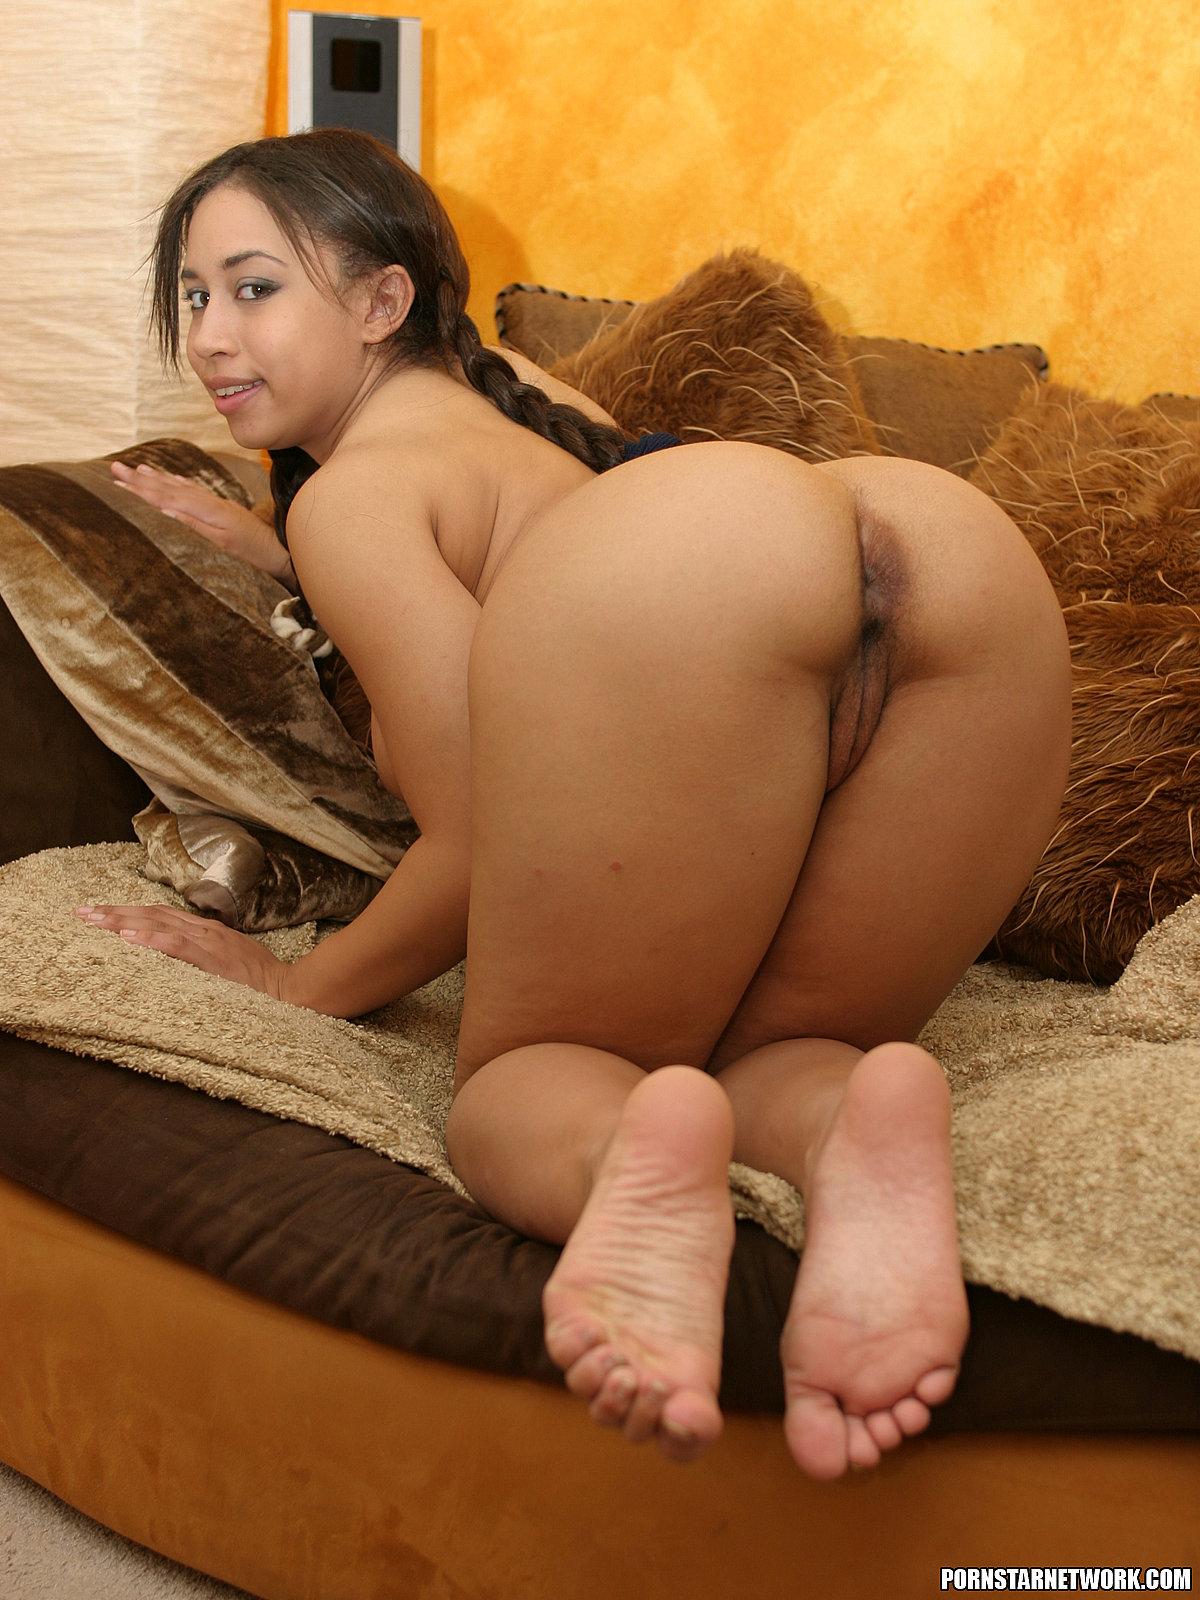 Big Tits Pov Porn